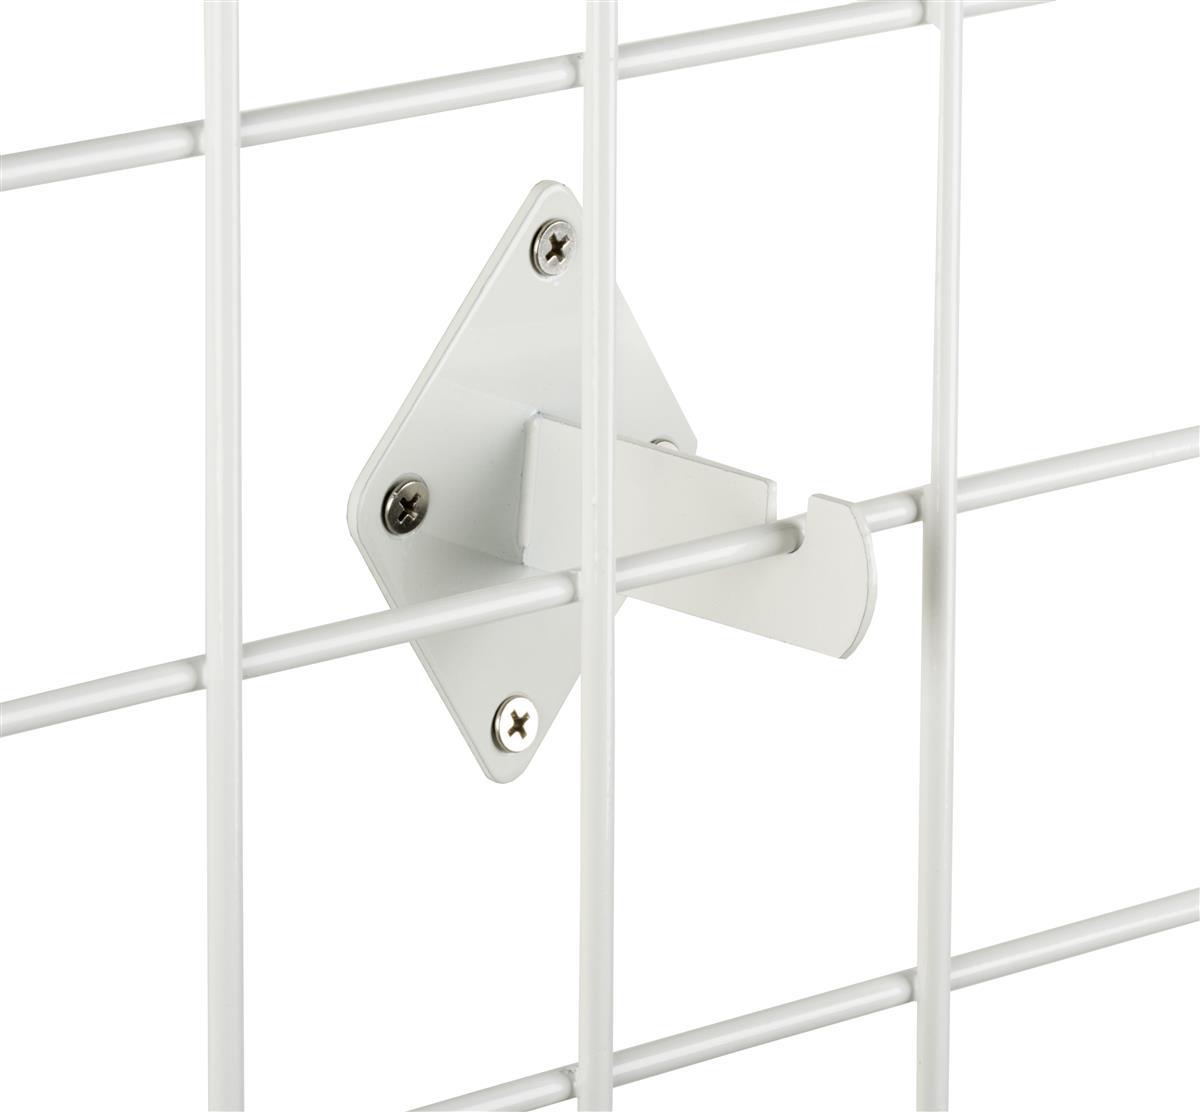 Case of 8 New or Retail Gridwall White Shelf Bracket 8 inch